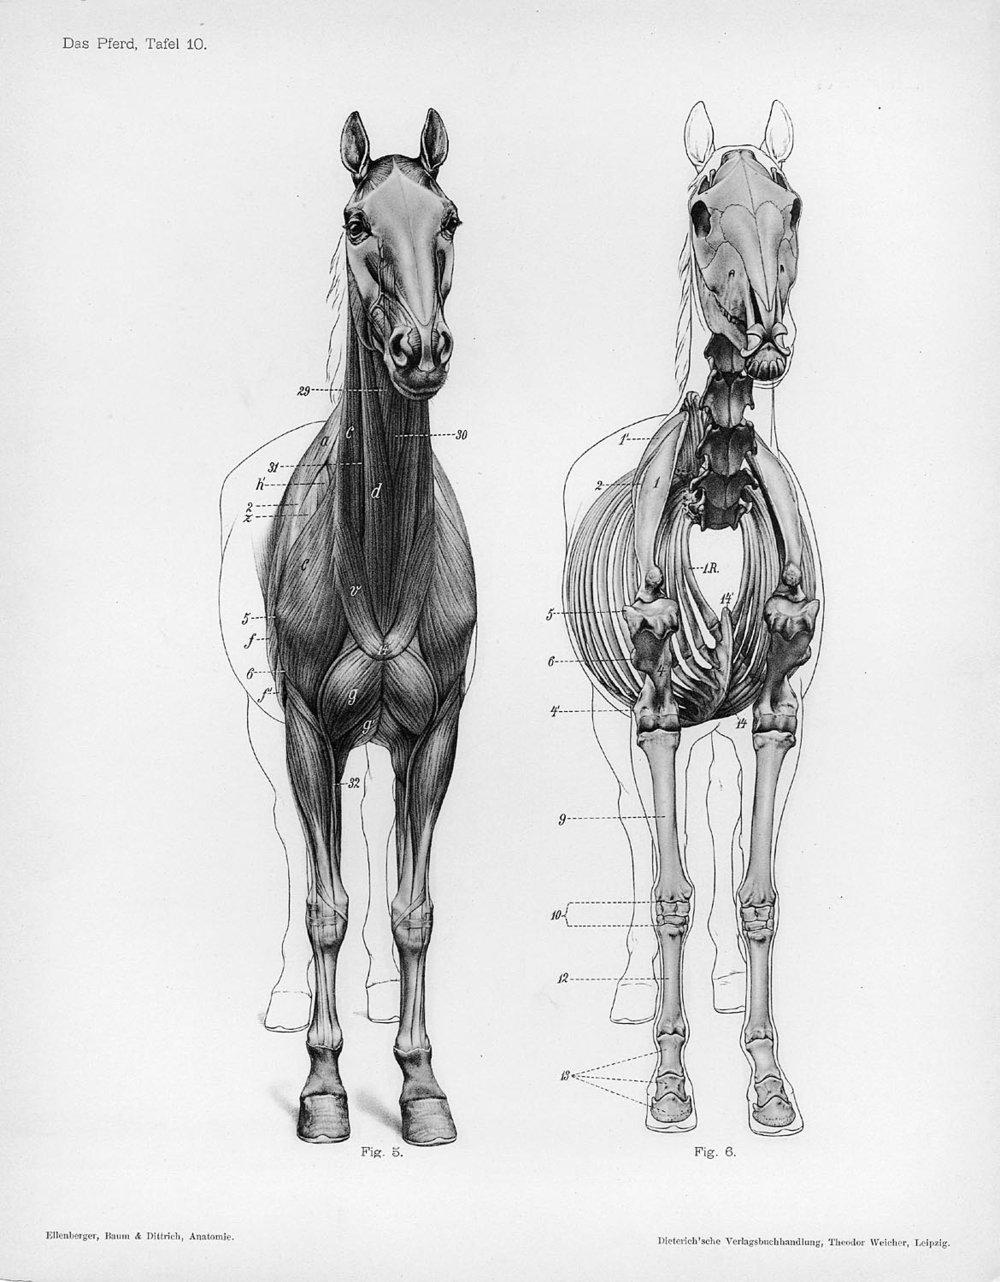 horse - 48f1cd4b18ec2164490c2afffc5eed33.jpg